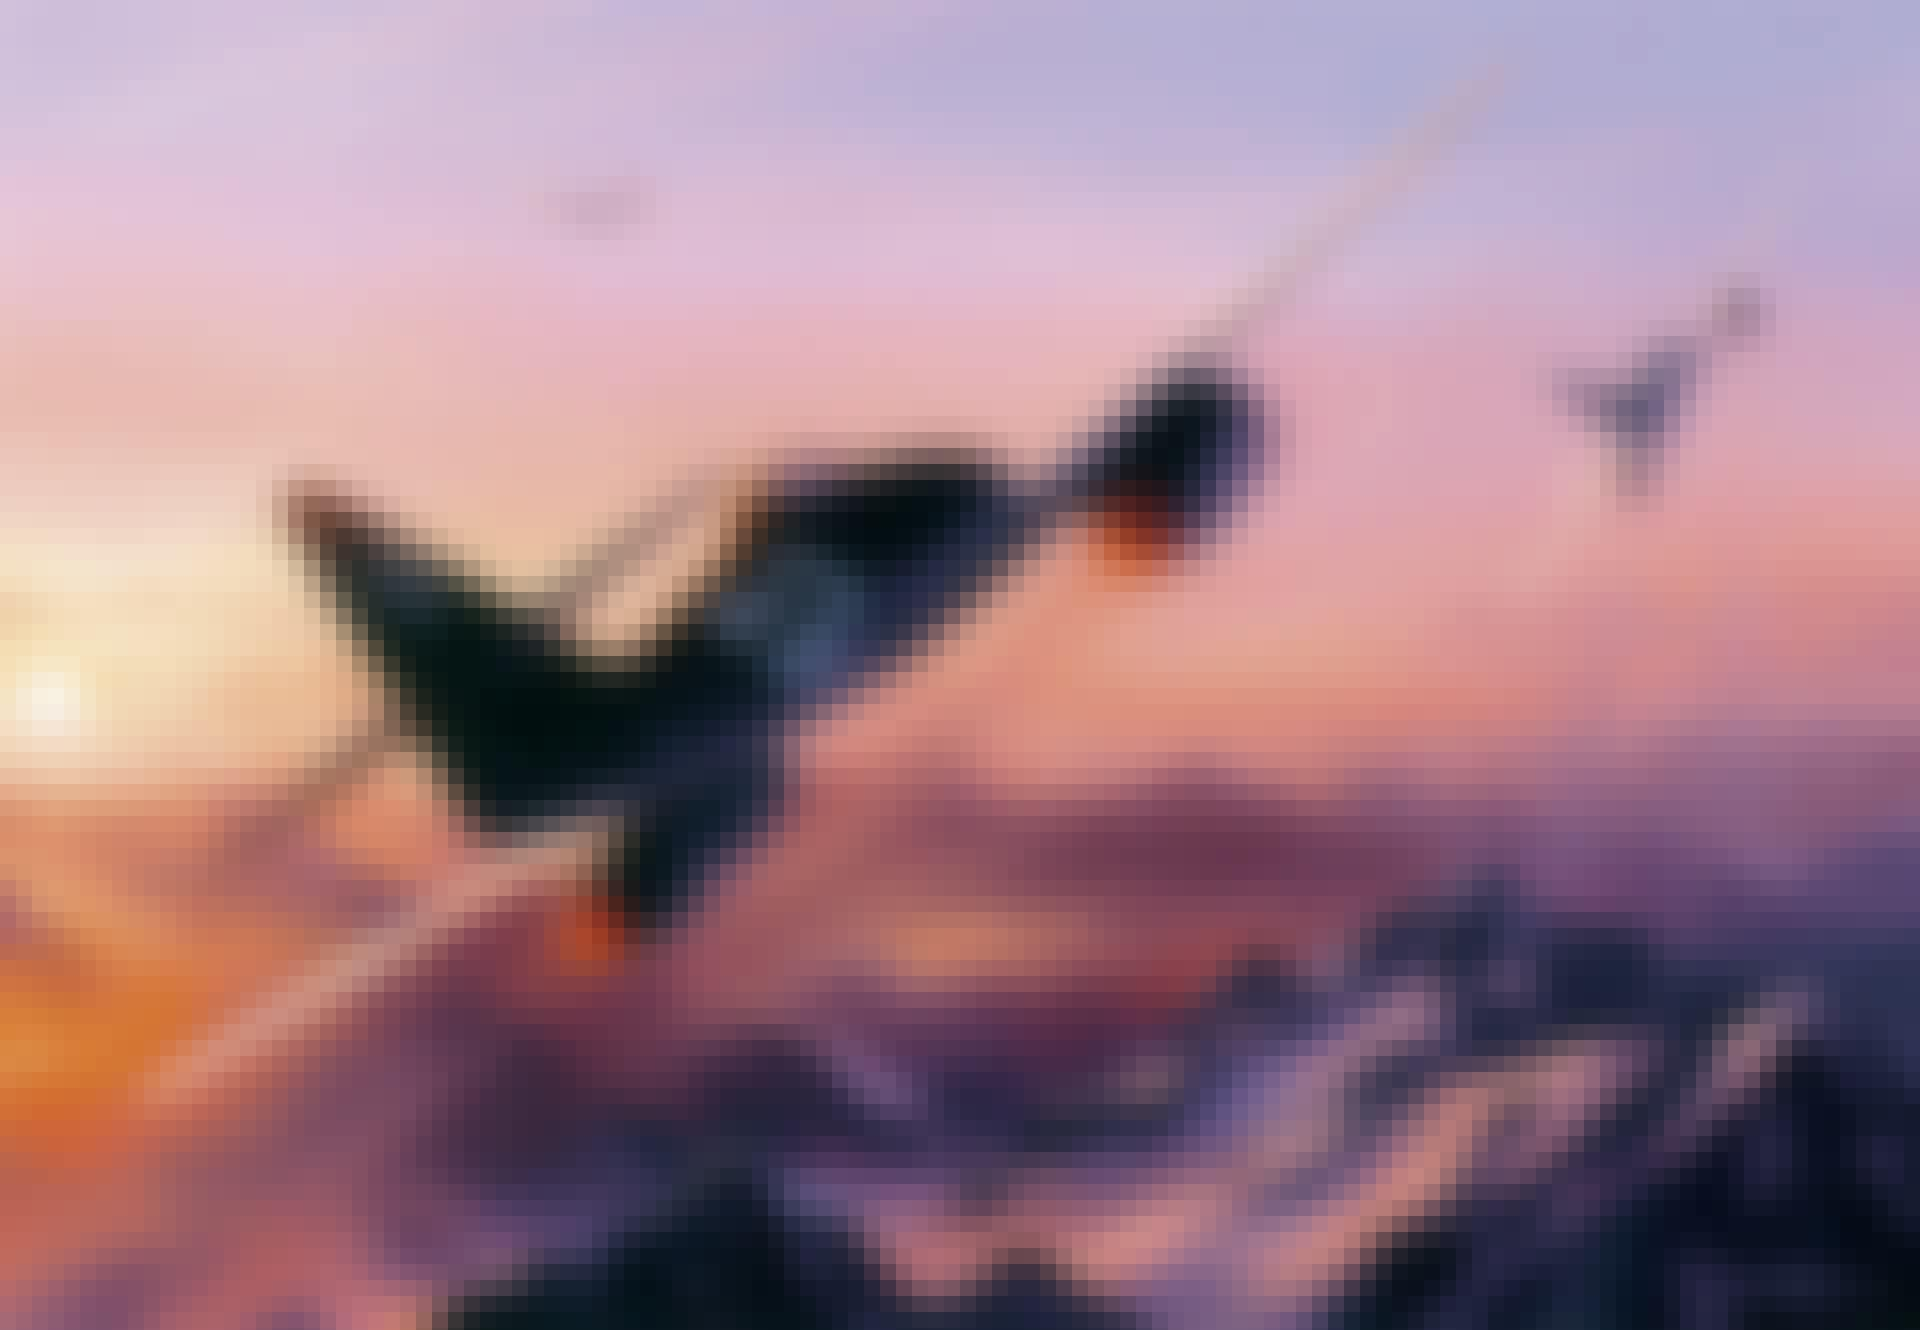 nazistiskt jetflygplan b-17 sturmvogel